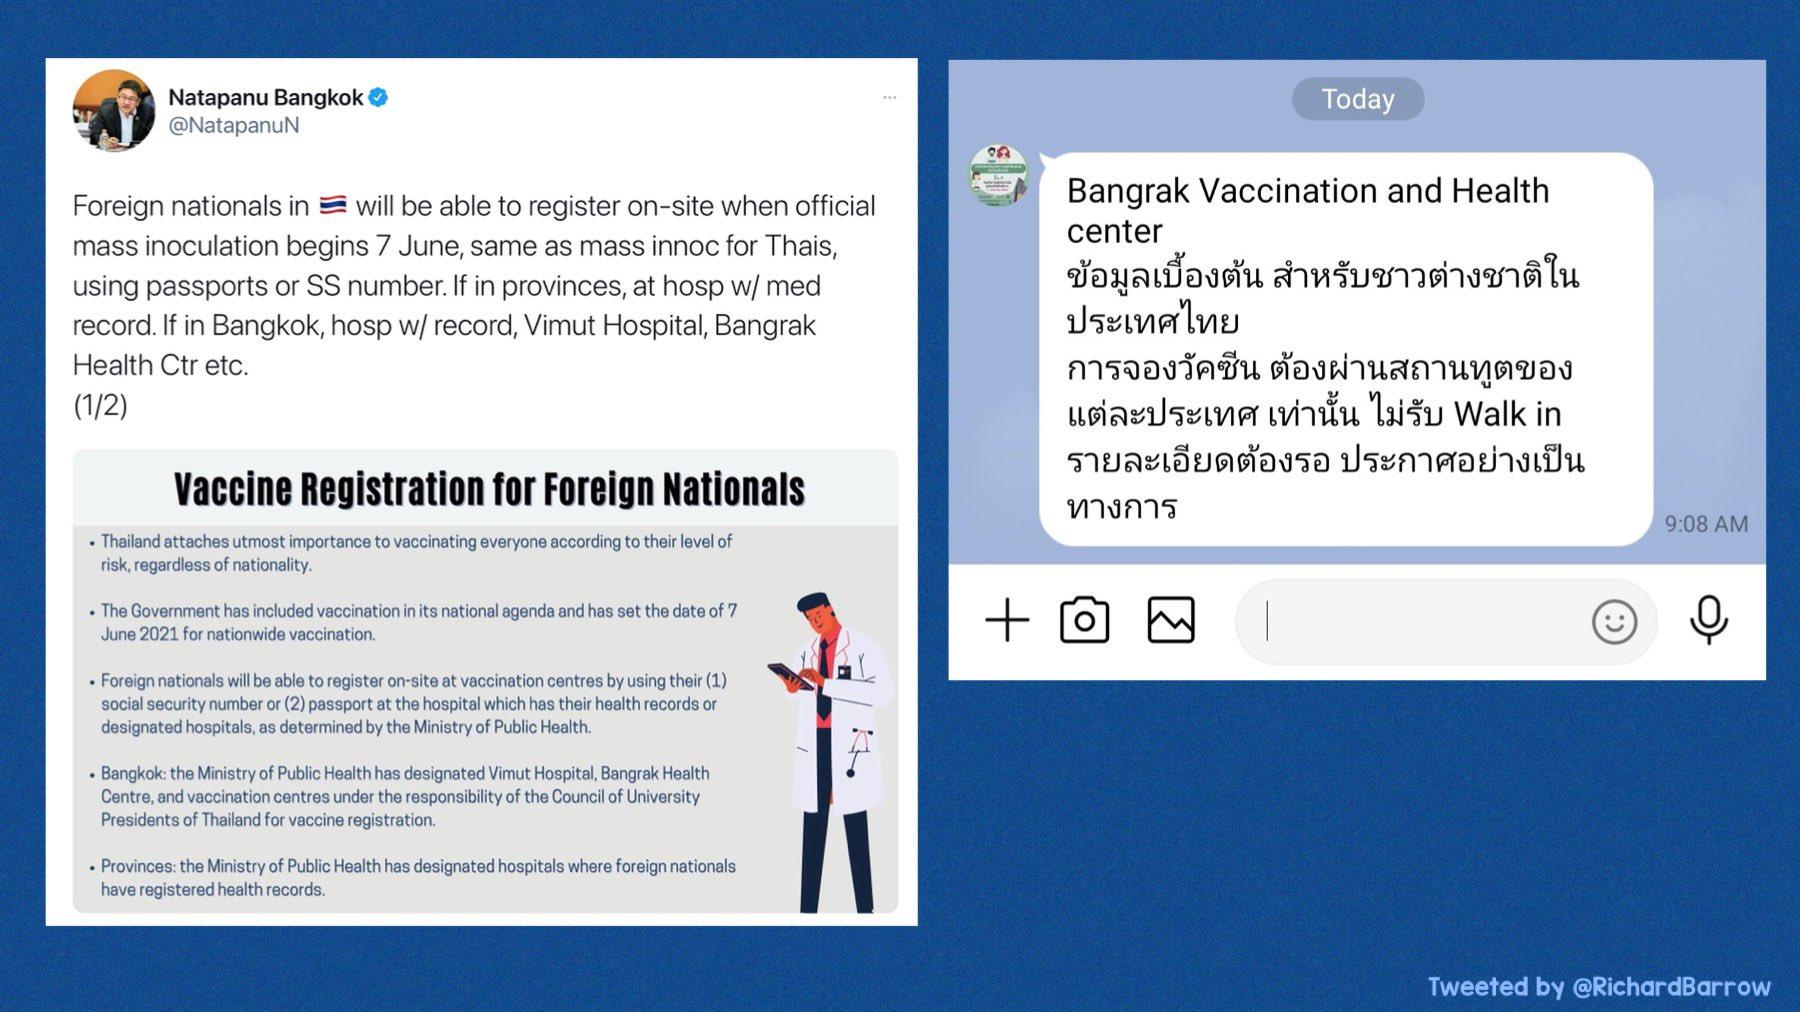 www.thaiguide.dk/images/forum/covid19/bangkok%20vaccination%20booking%2004-06-21.jpg